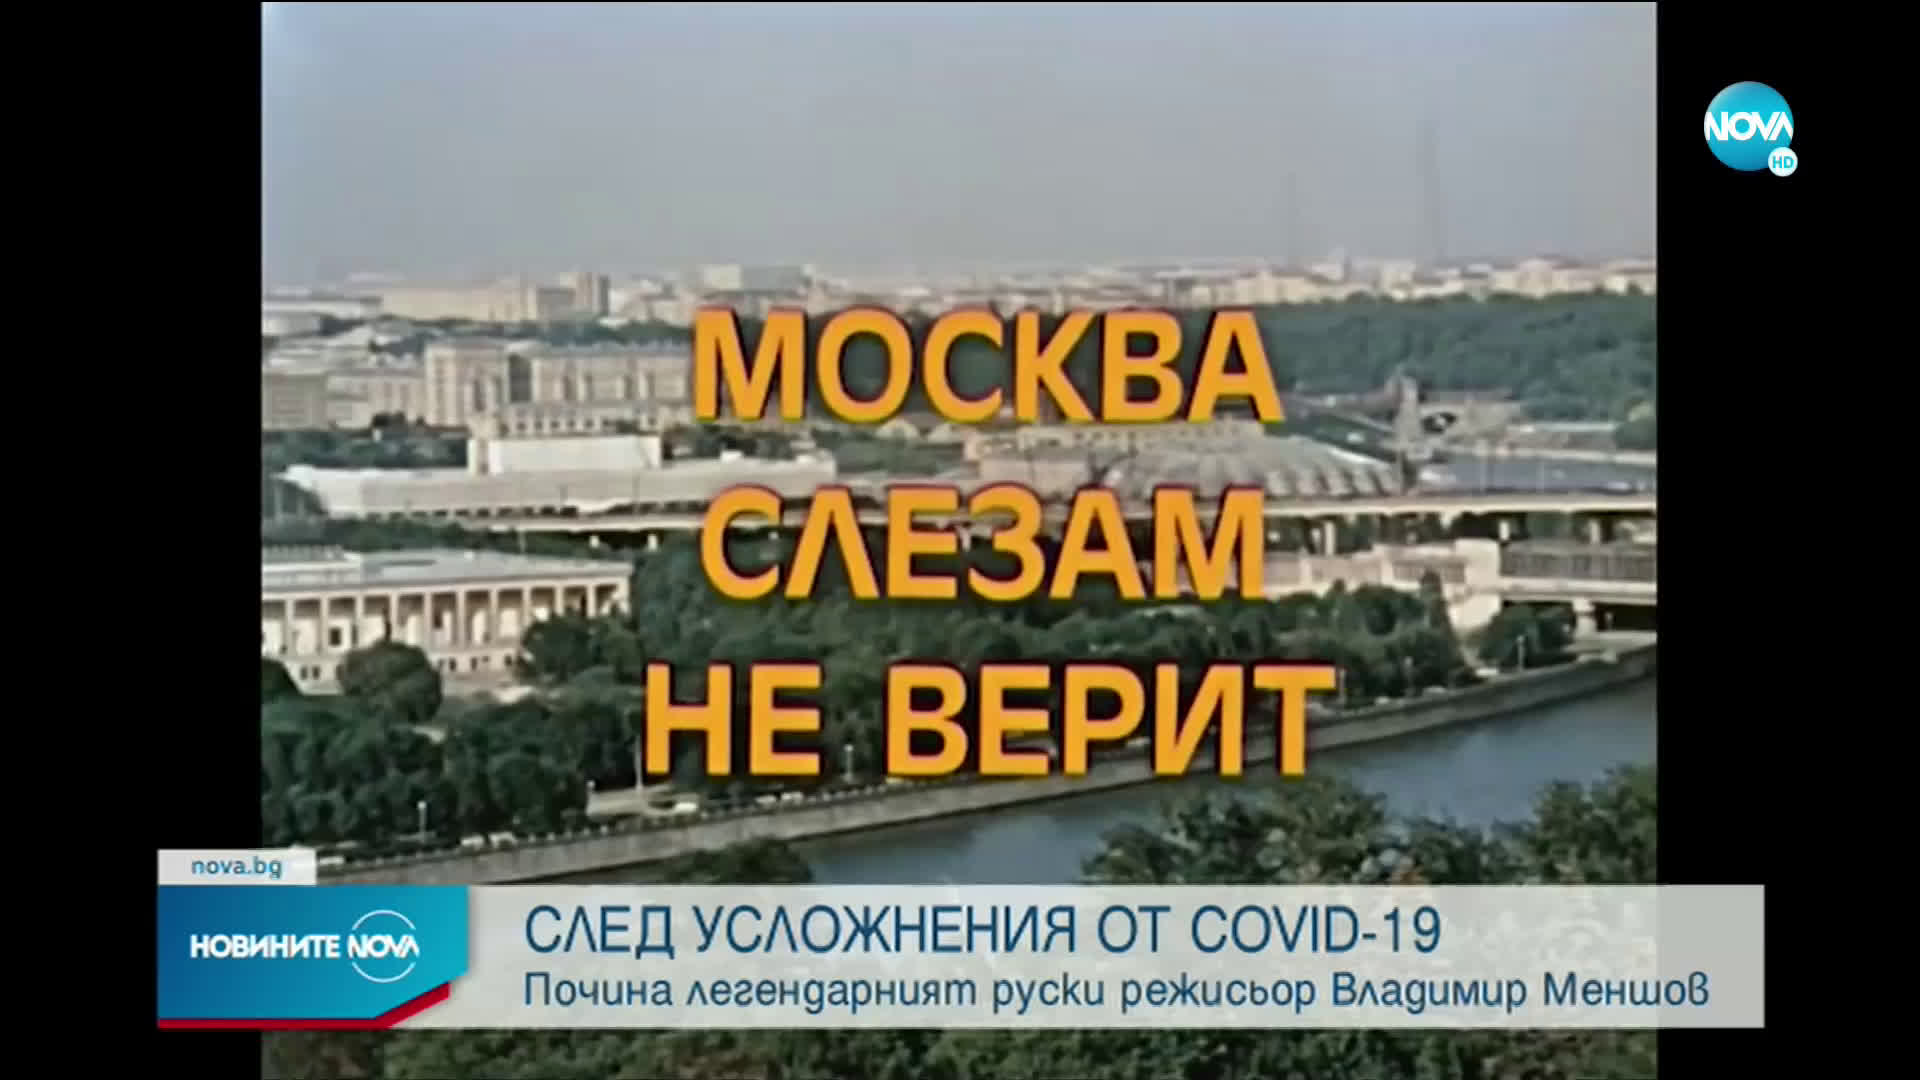 Почина режисьорът Владимир Мeншов